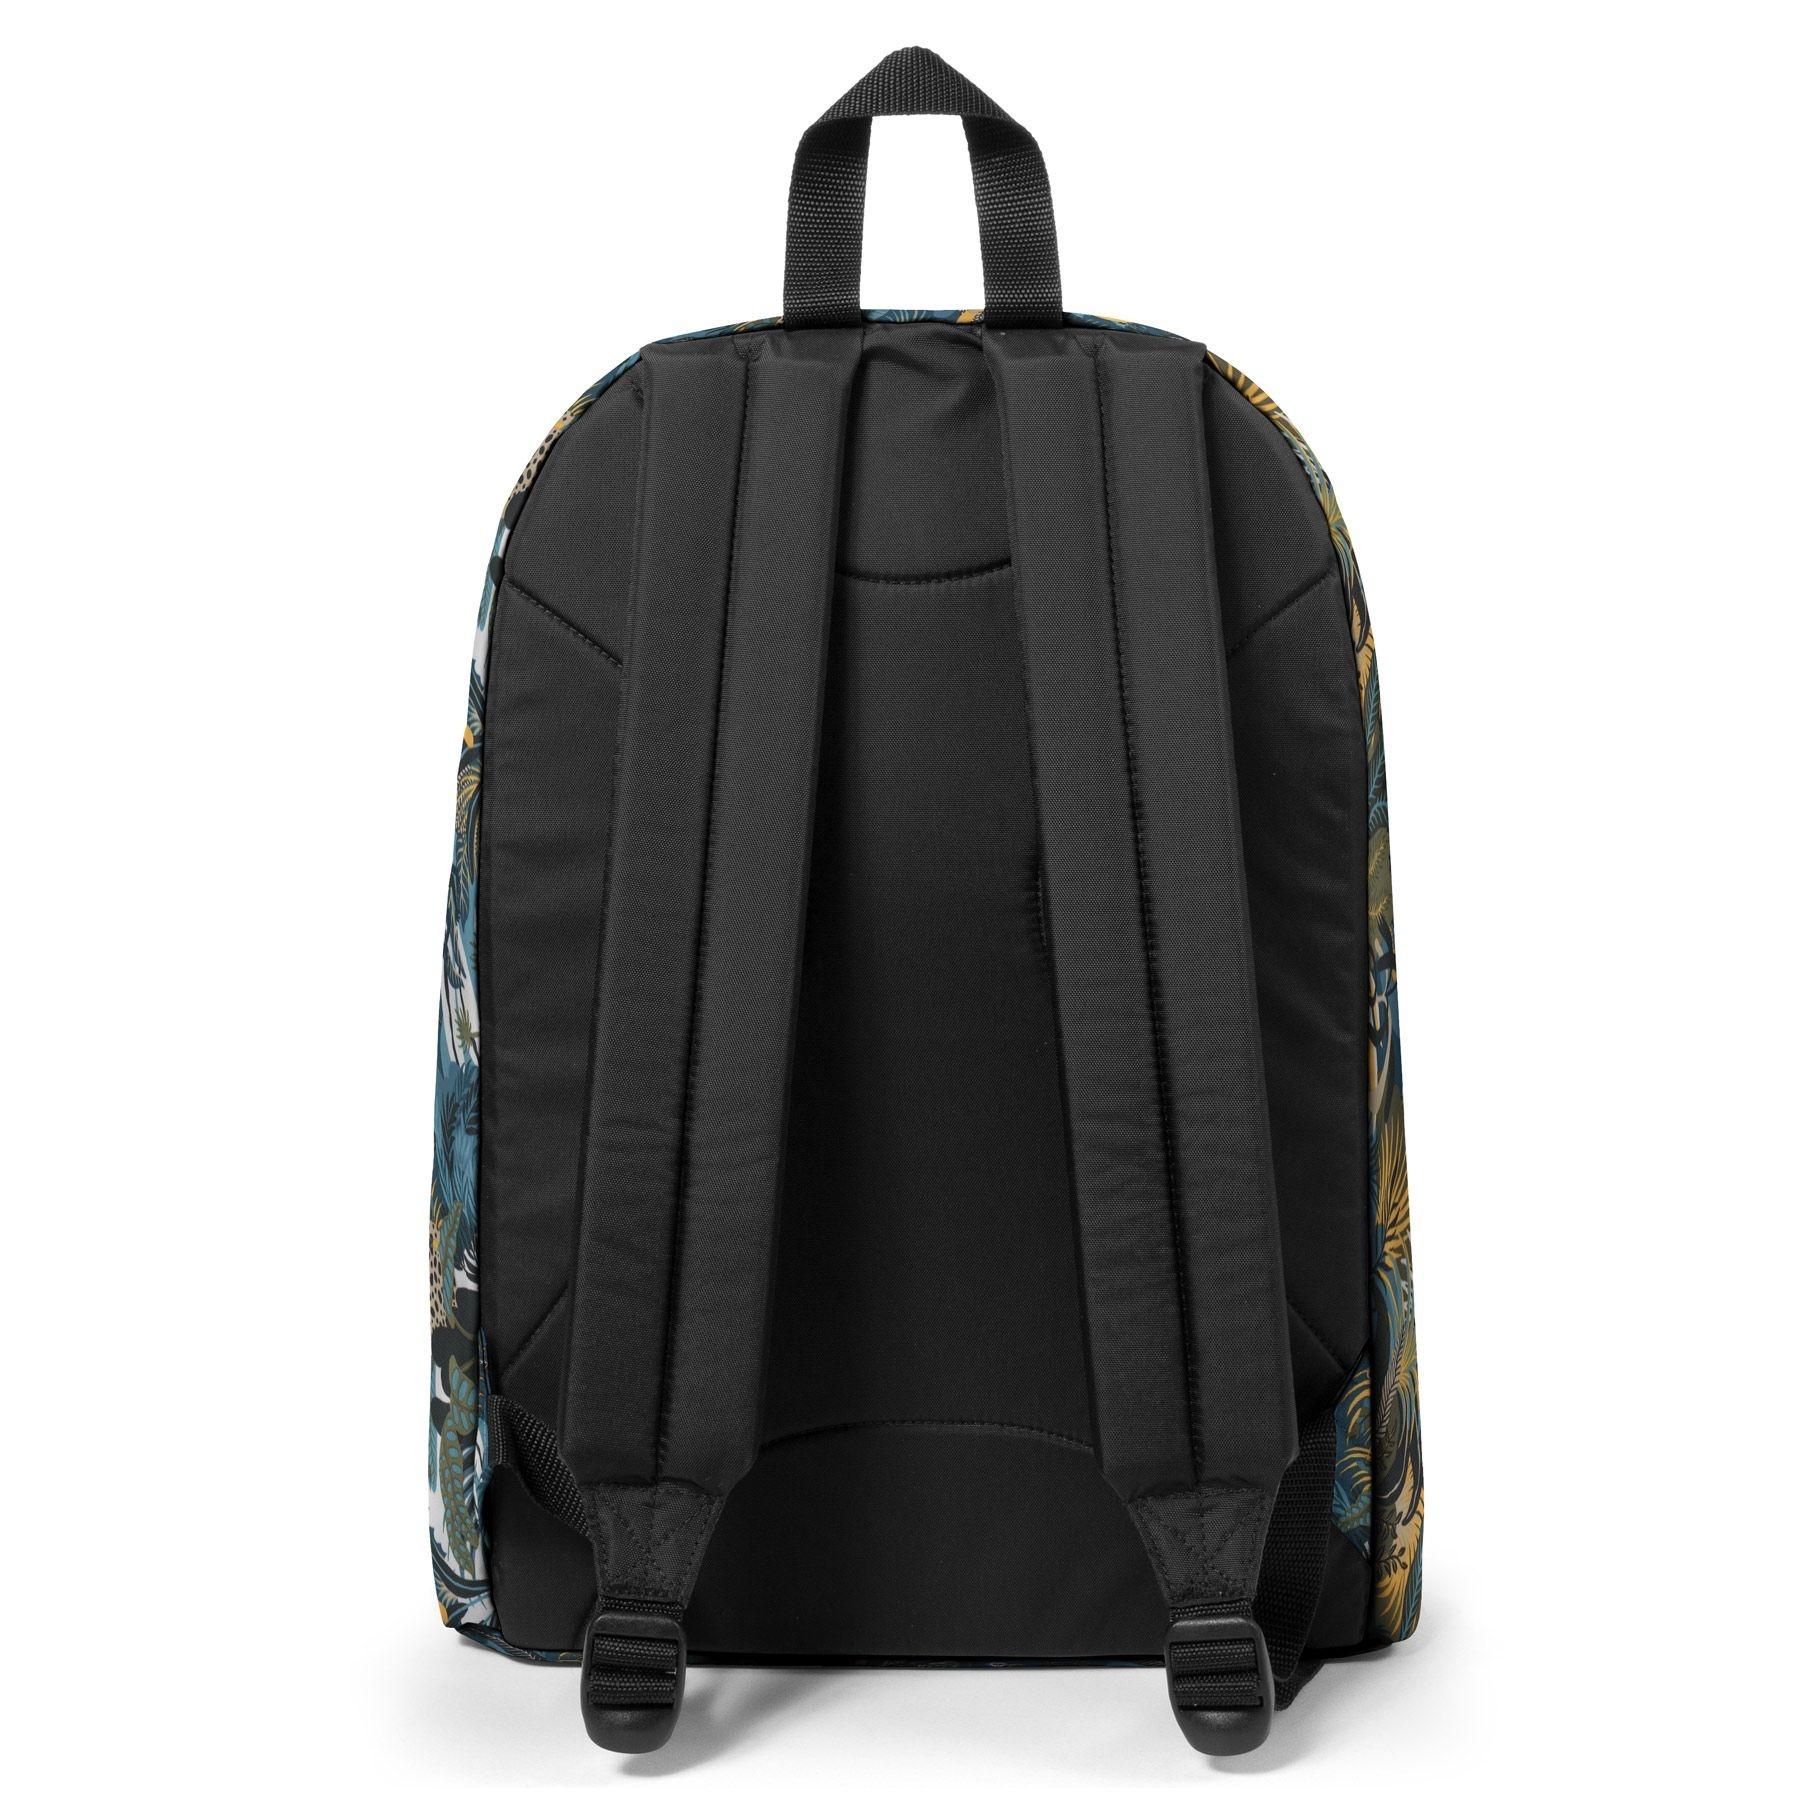 Eastpak Eastpak Out Of Office Jam In The Leaves 15 inch laptop rugtas